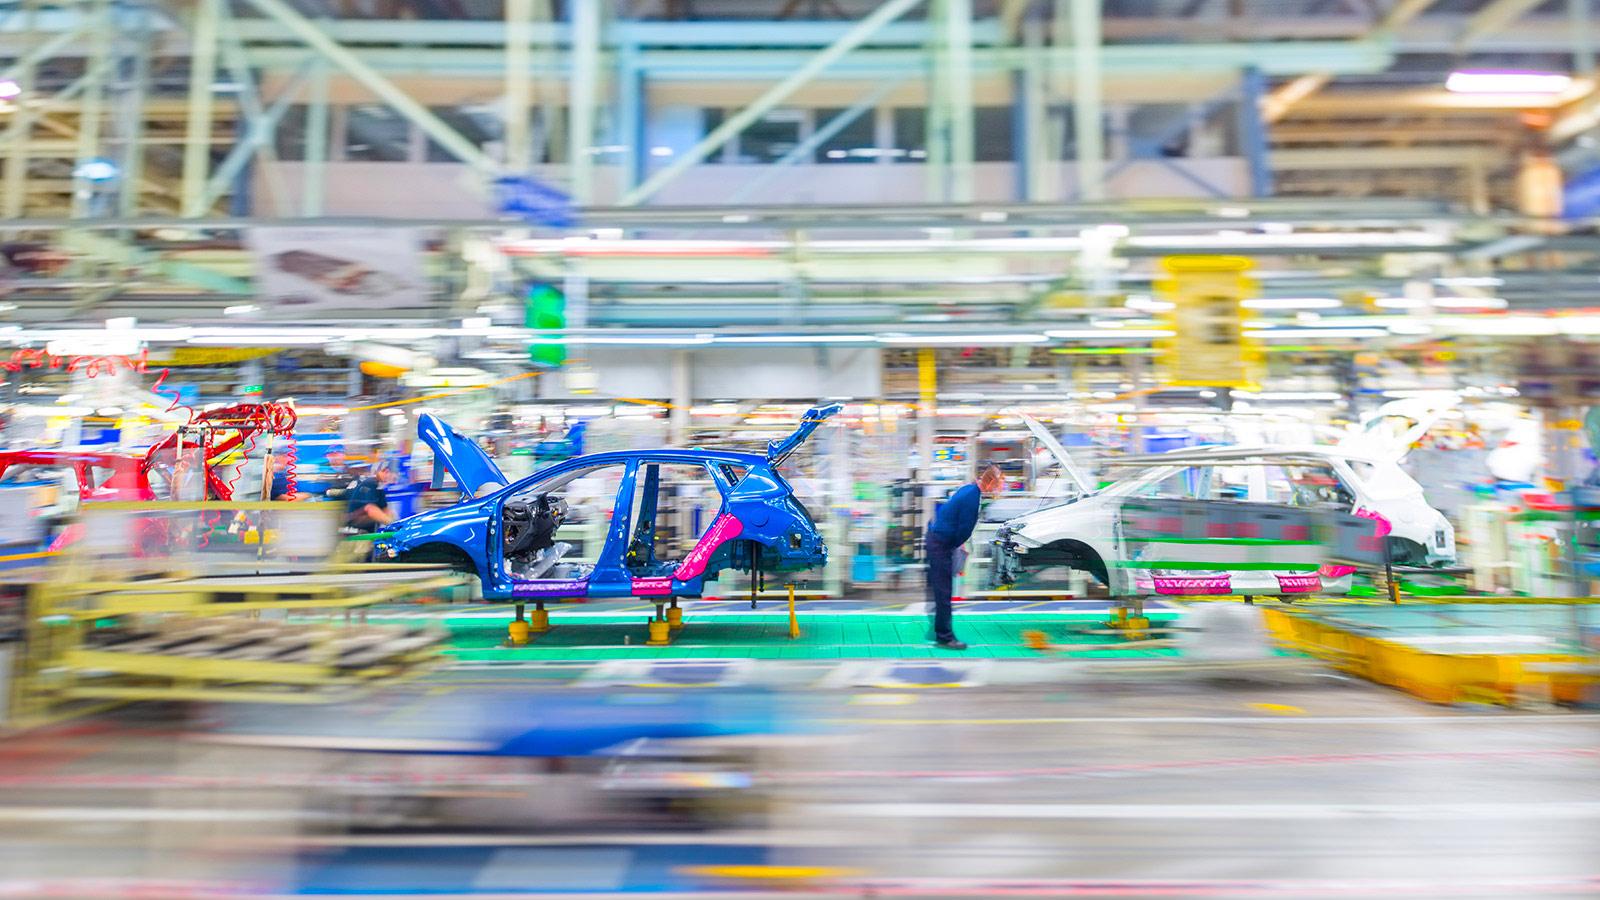 Operations Toyota Motor Europe